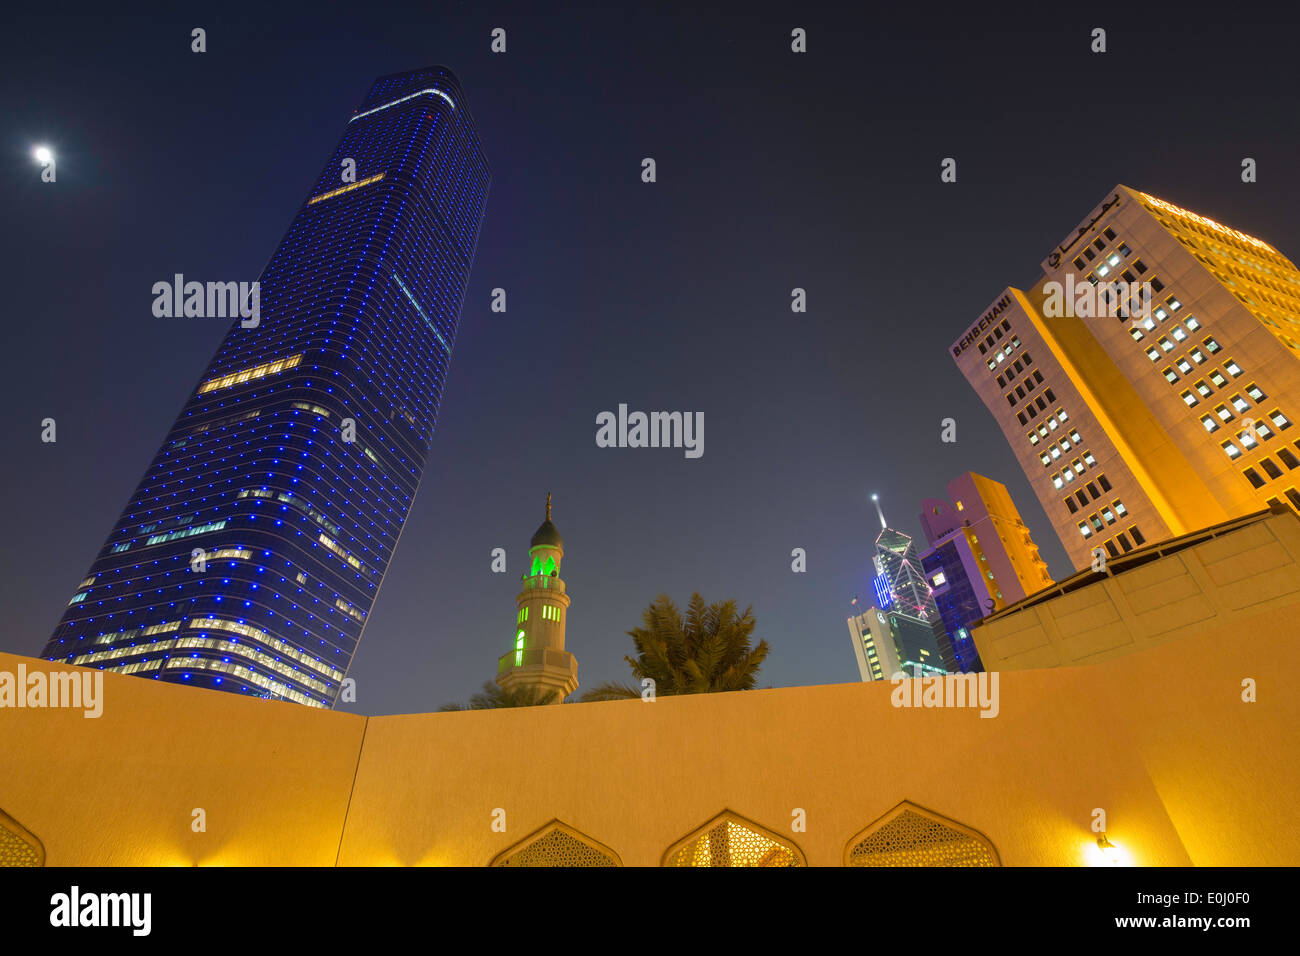 Kuwait City, city skyline including the Al Hamra building, low angle view - Stock Image